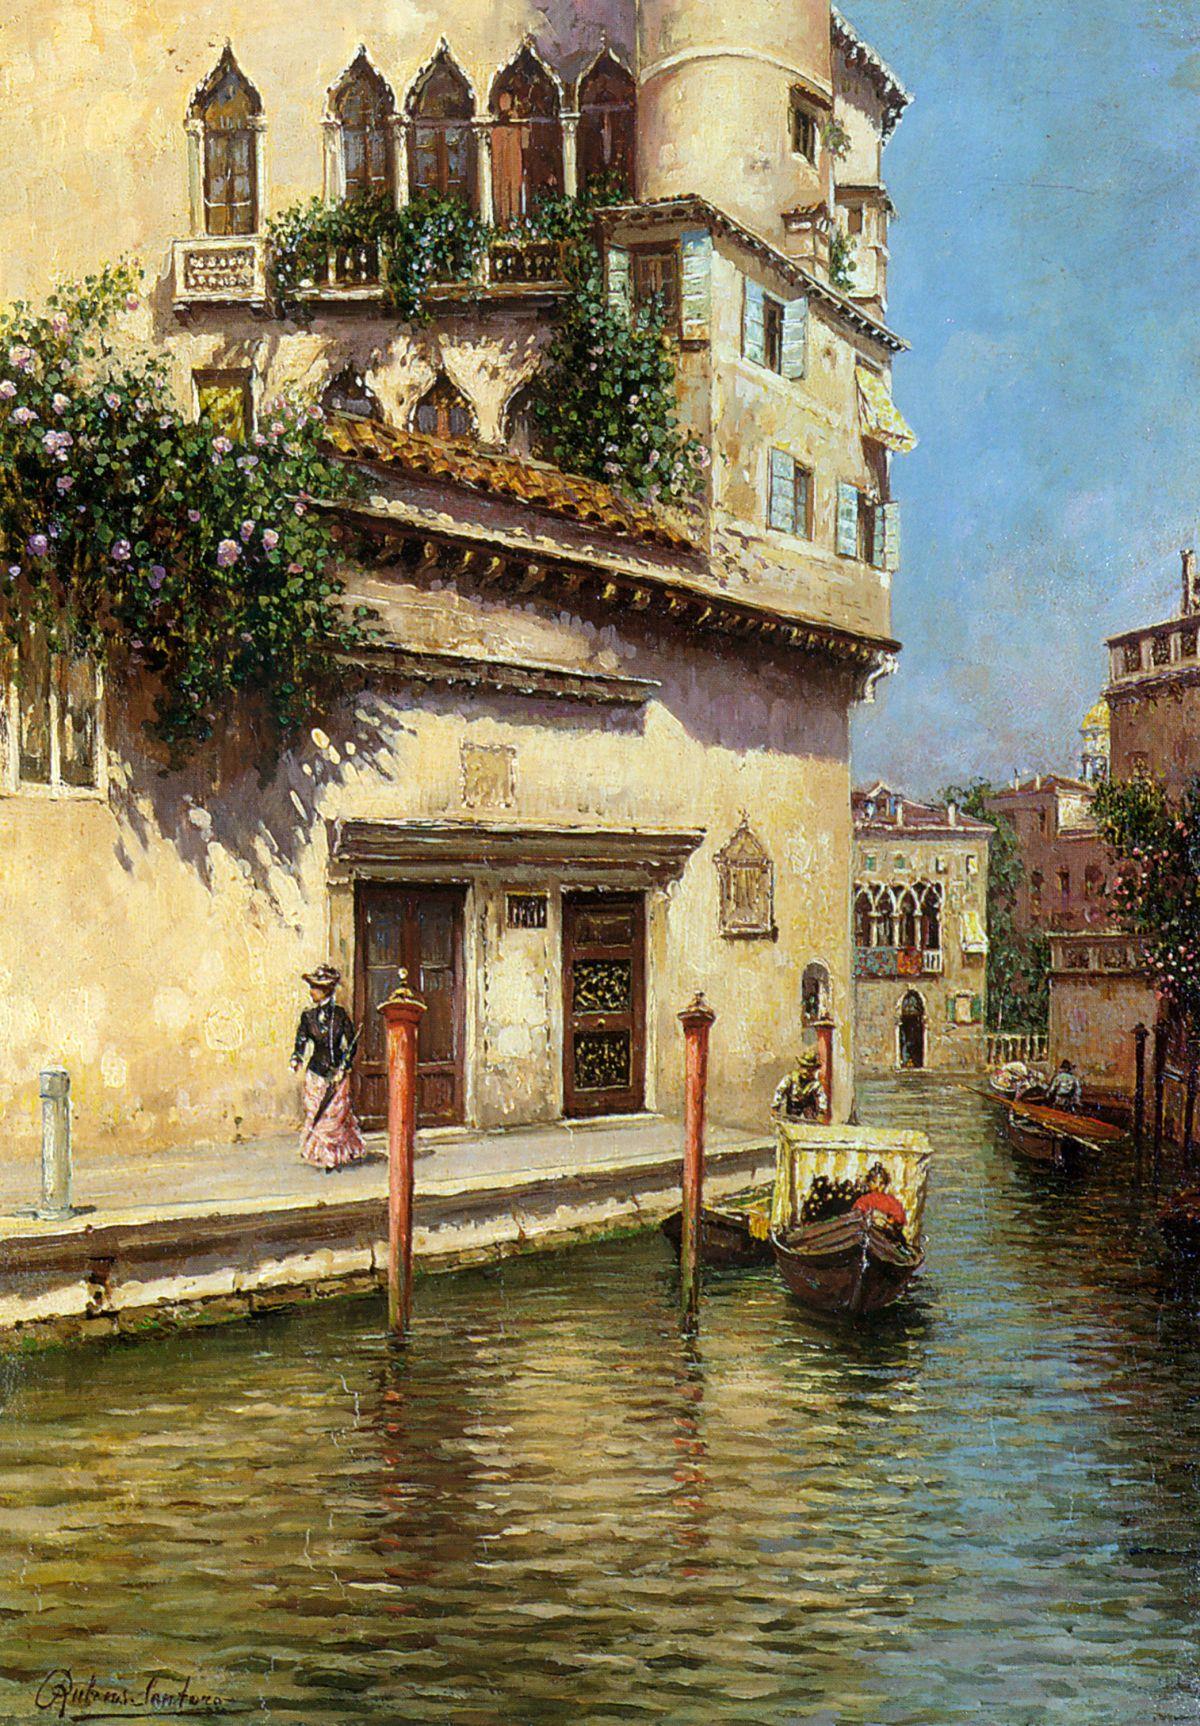 A Venetian Backwater by Rubens Santoro